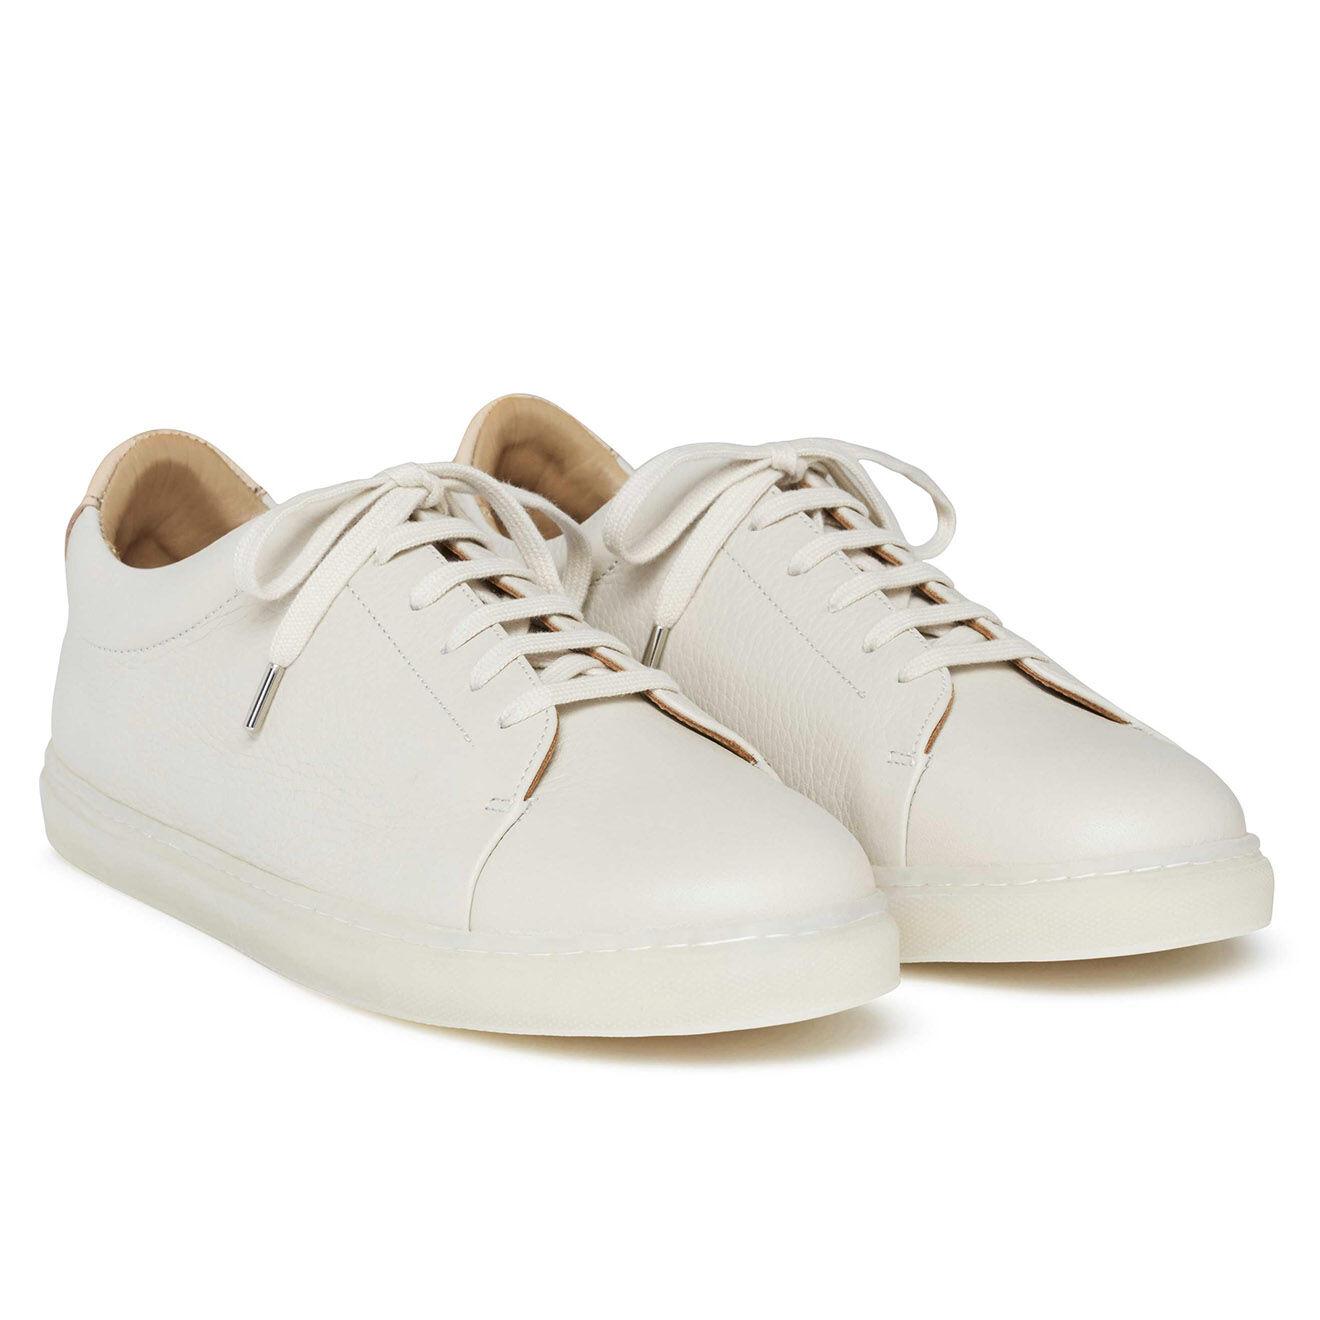 Sneakers en Cuir grainé Martel écrues